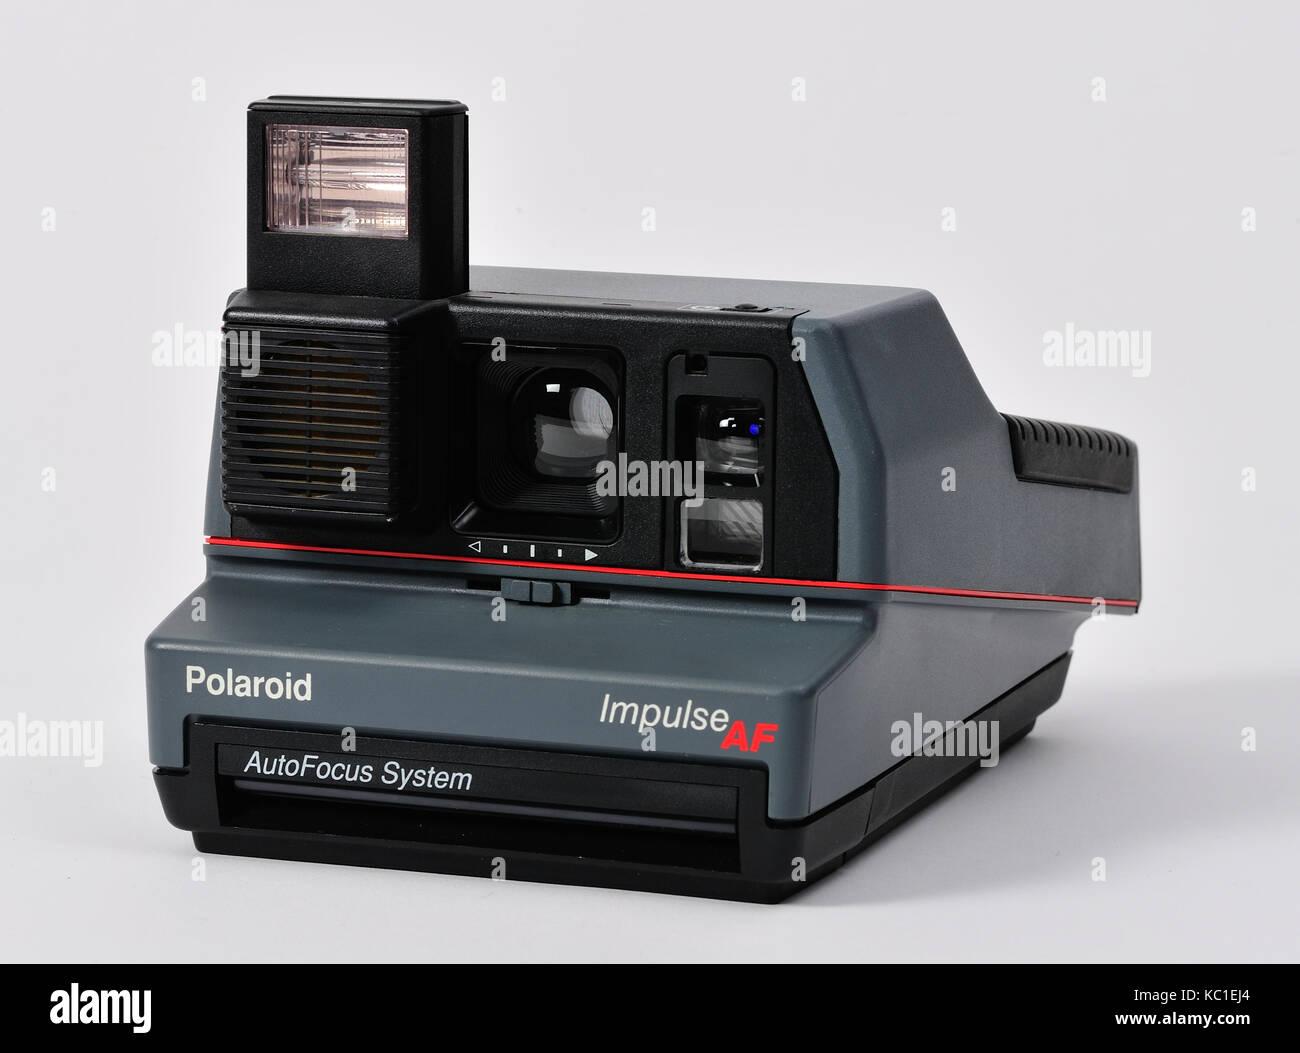 vintage polaroid land camera with instruction manual and box stock rh alamy com Polaroid Impluse Polaroid Automatic 250 Land Camera